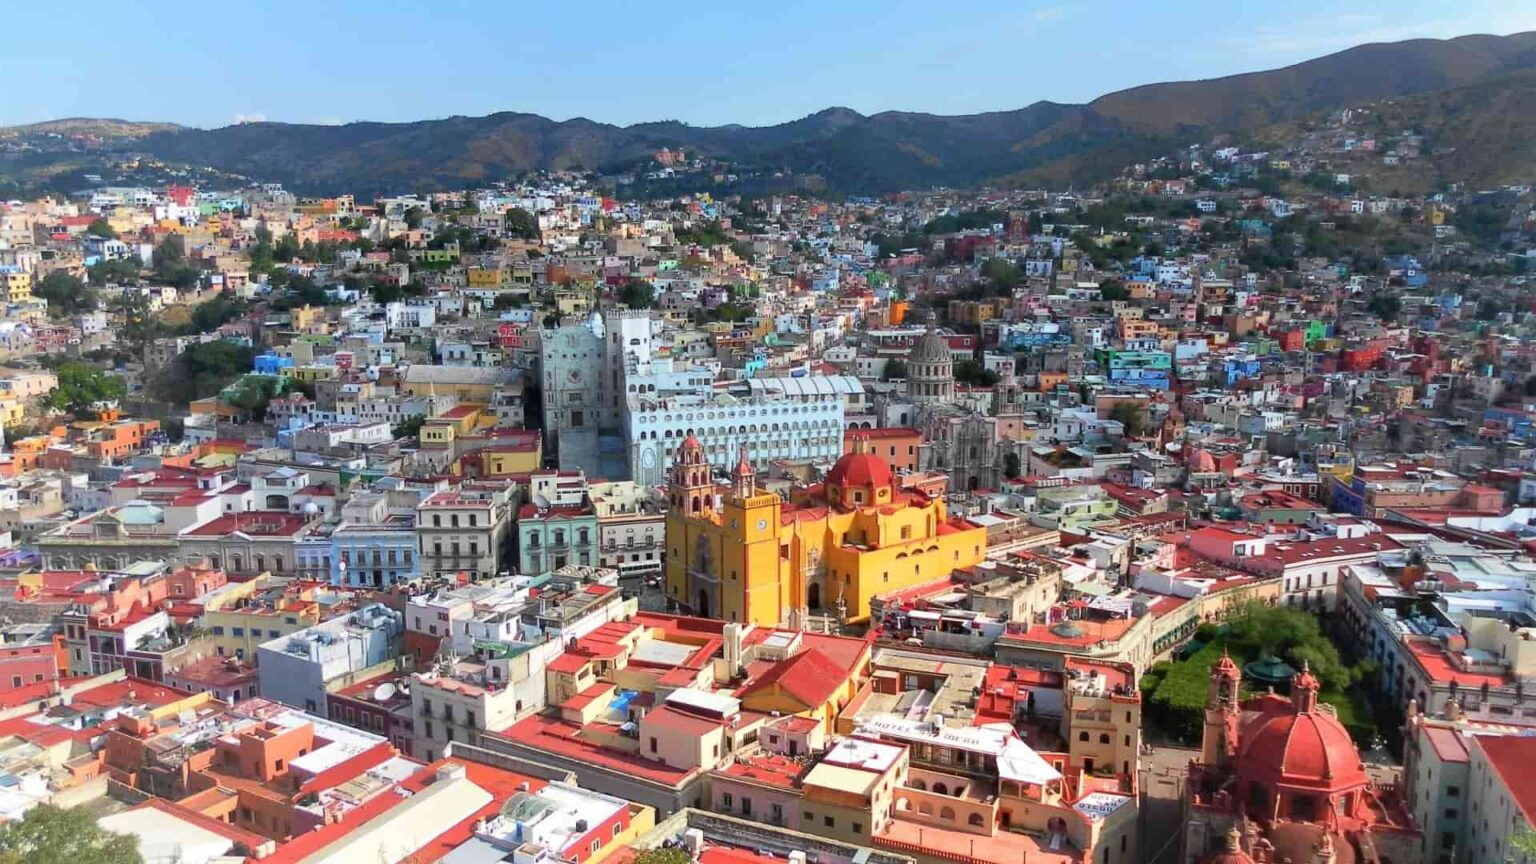 galerie photos voyage Mexique, la ville de Guanajuato